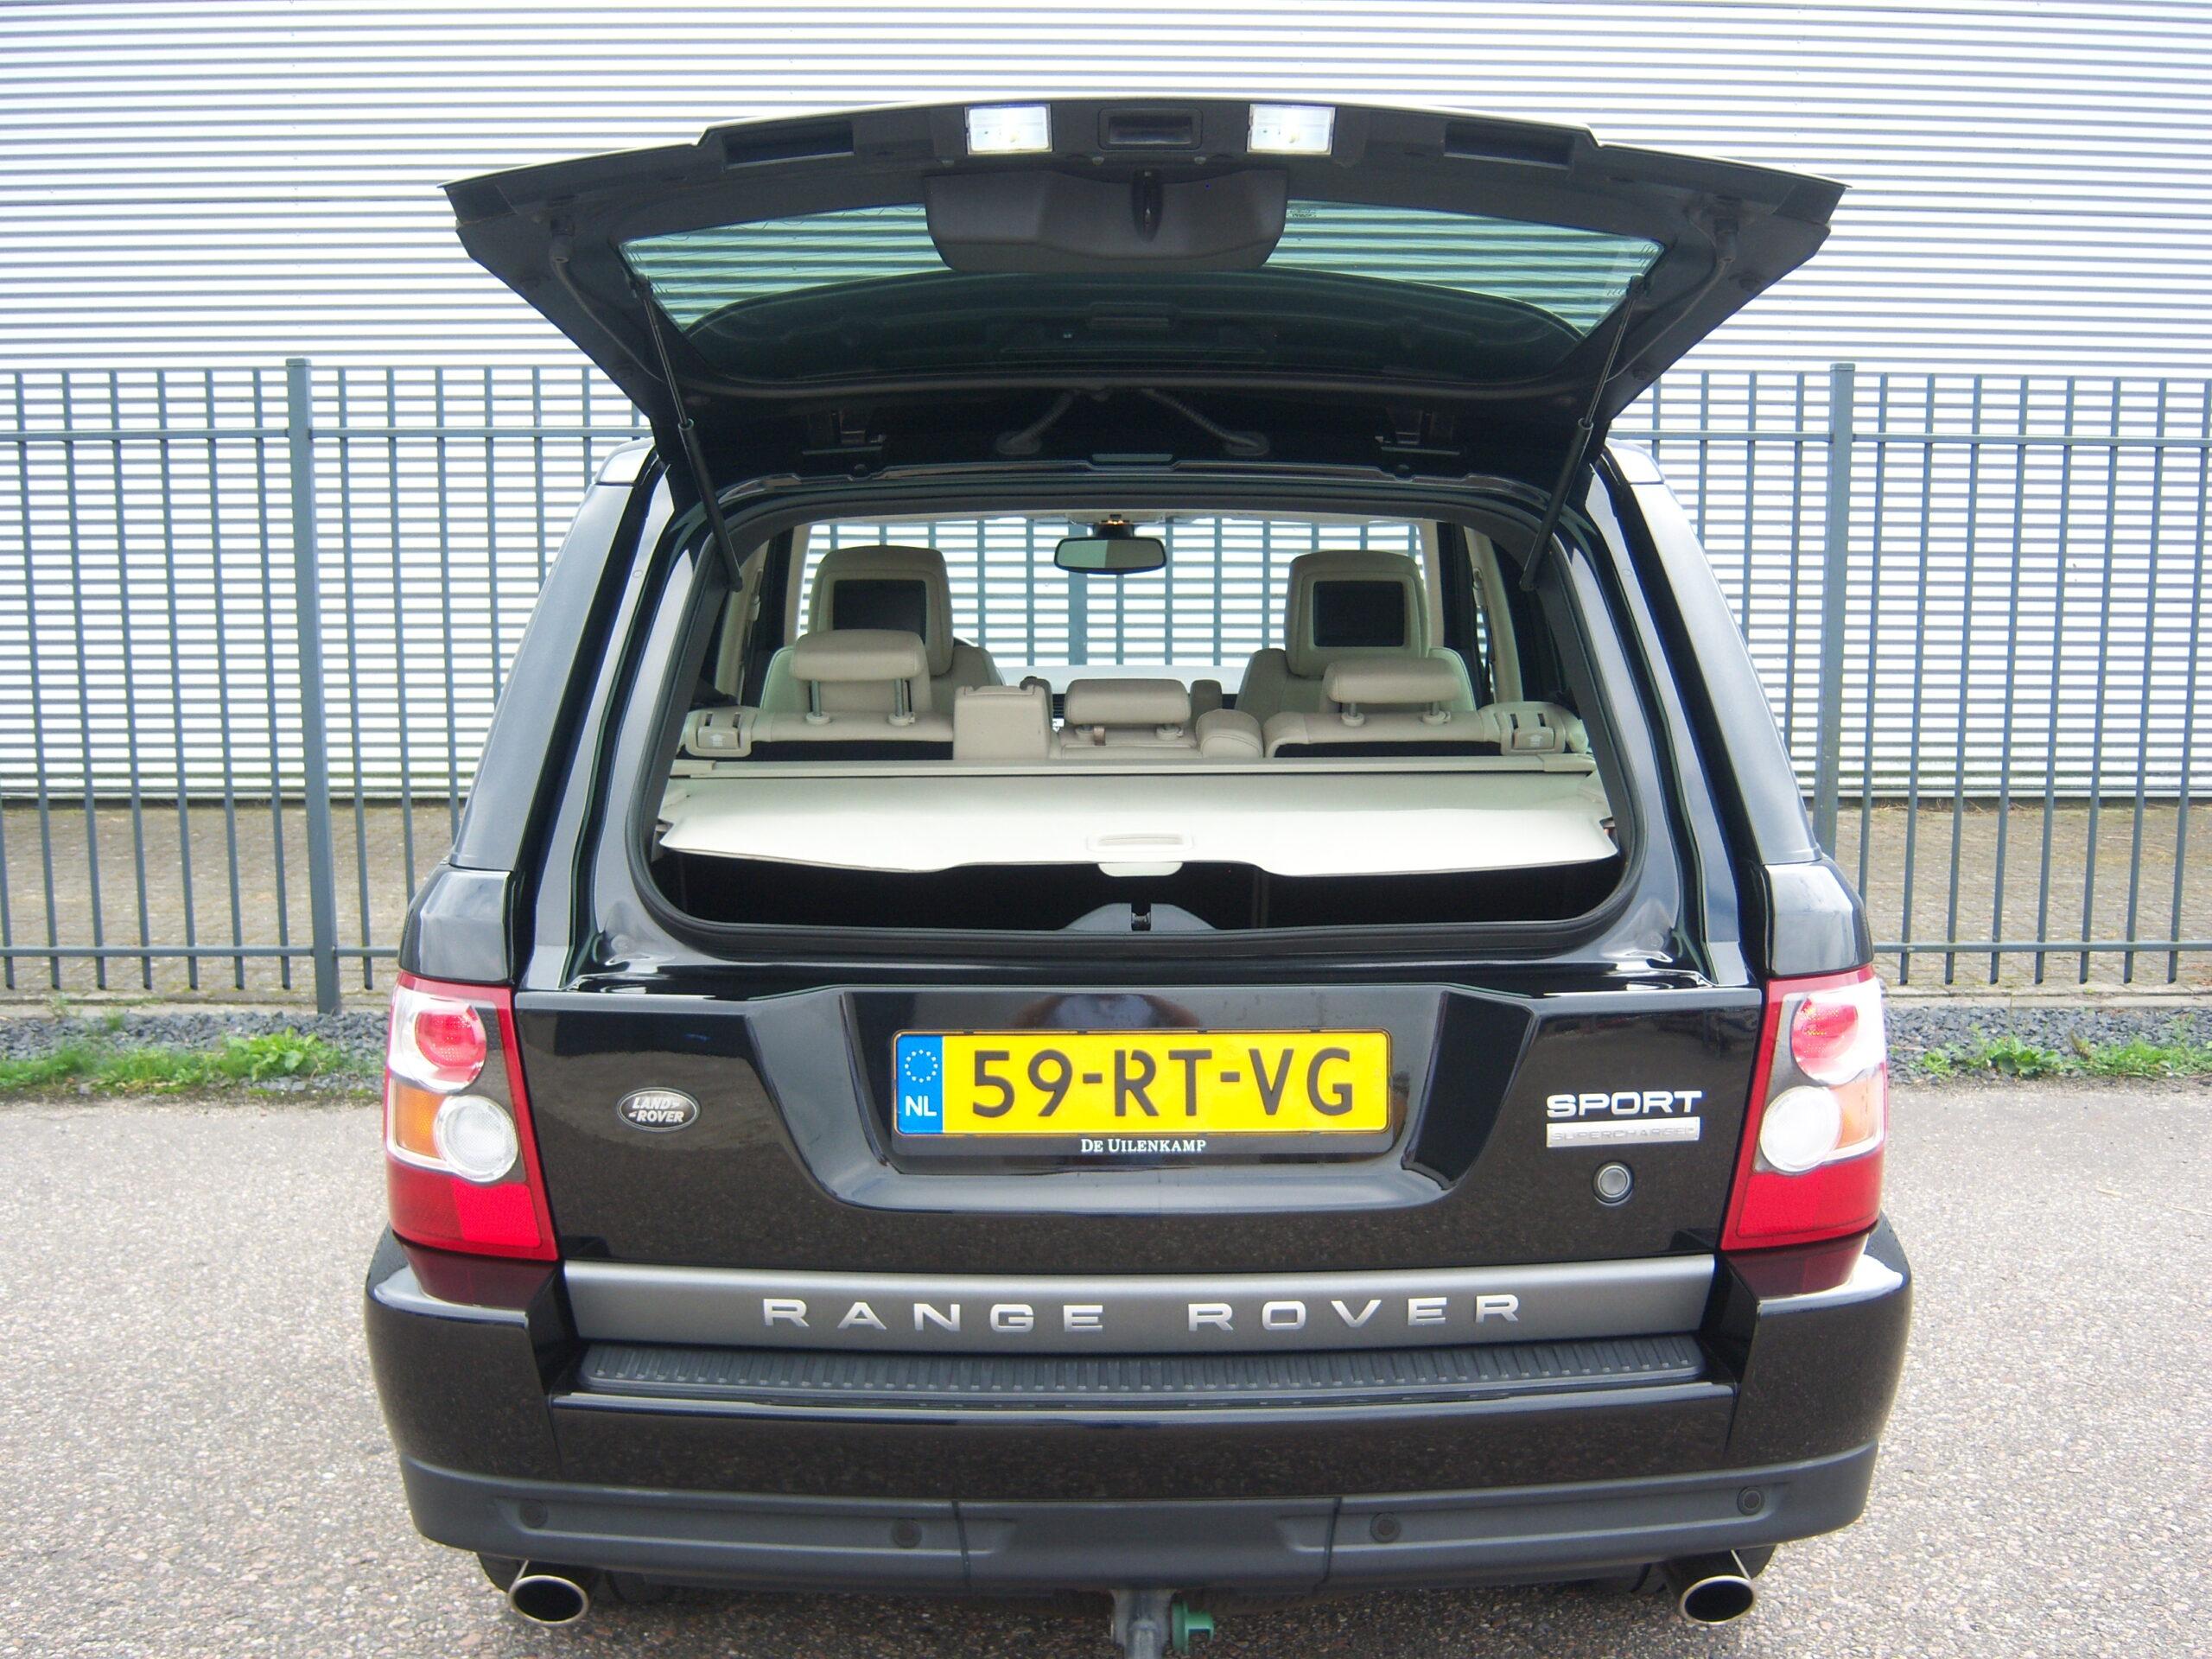 Range Rover Sport 4.2 V8 Supercharged/ NL auto/ Youngtimer/ BTW